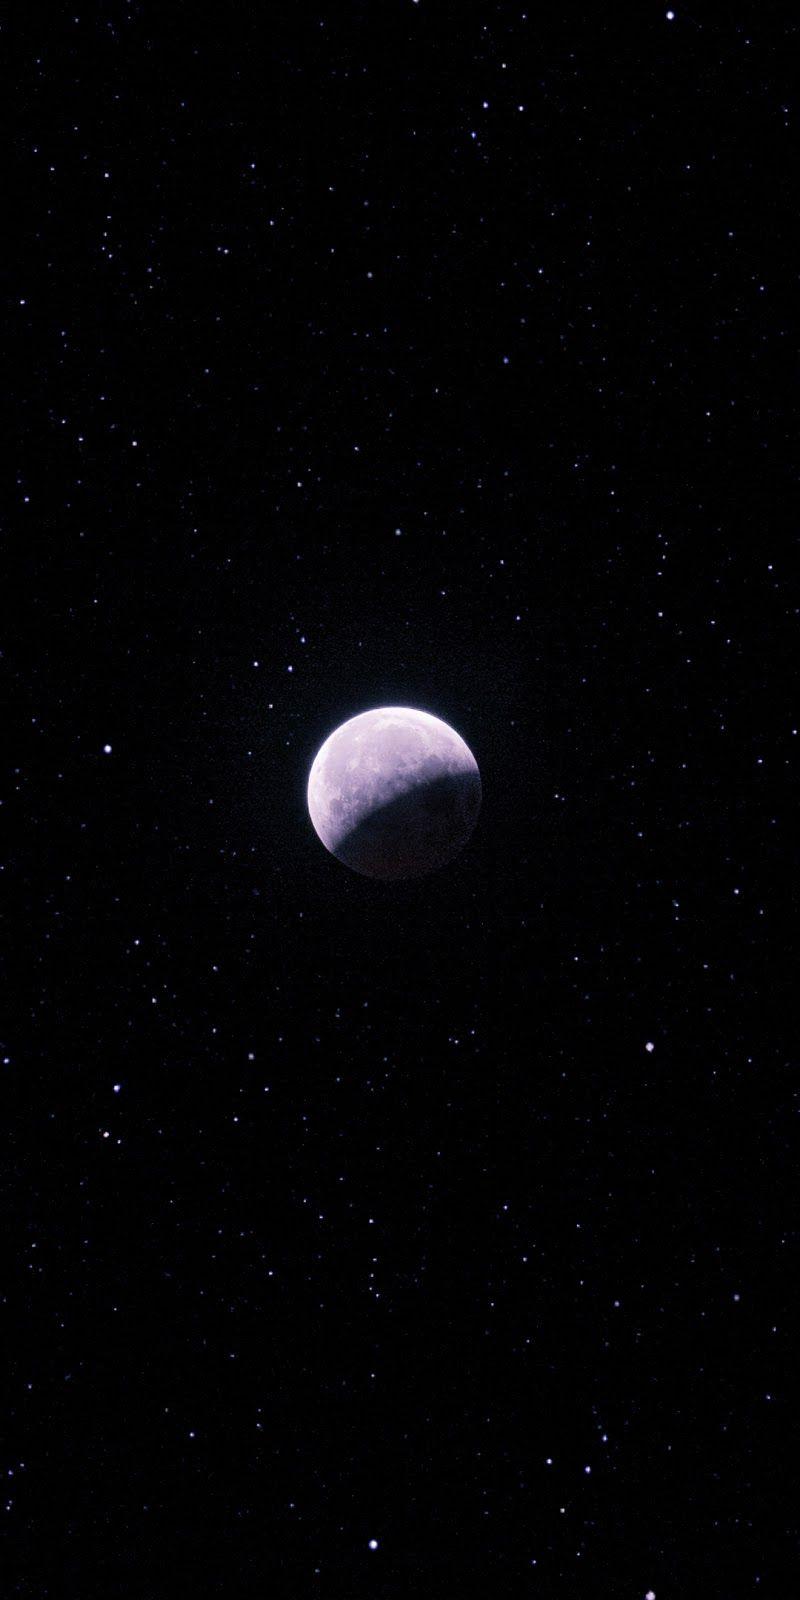 Purple Moon In 2020 Night Sky Wallpaper Iphone Background Wallpaper Beautiful Wallpapers Backgrounds